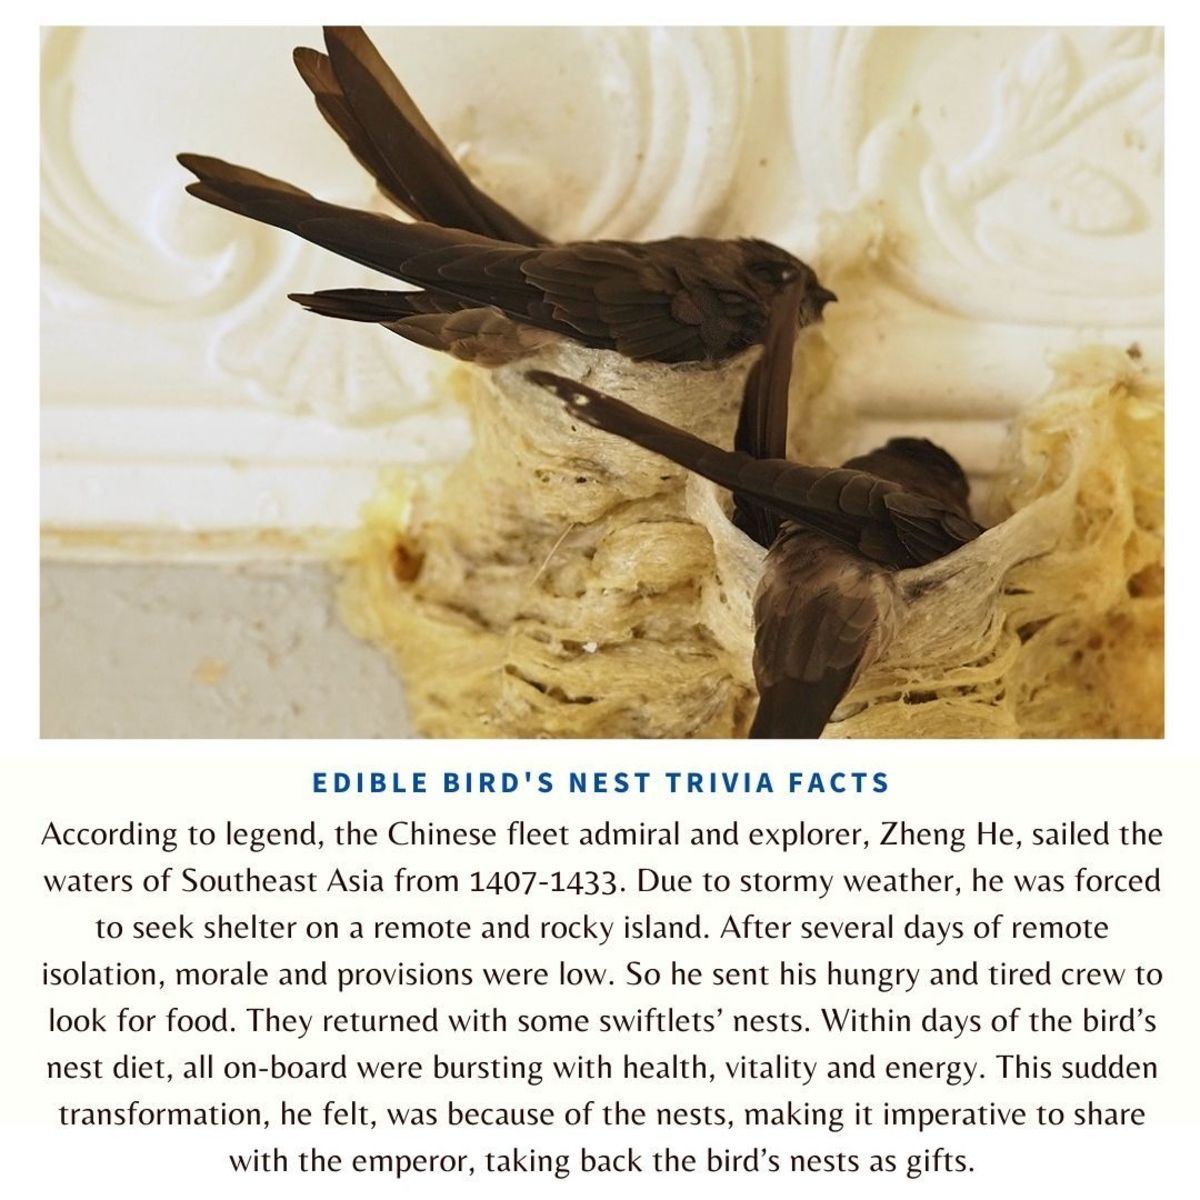 Edible bird's nest trivia facts